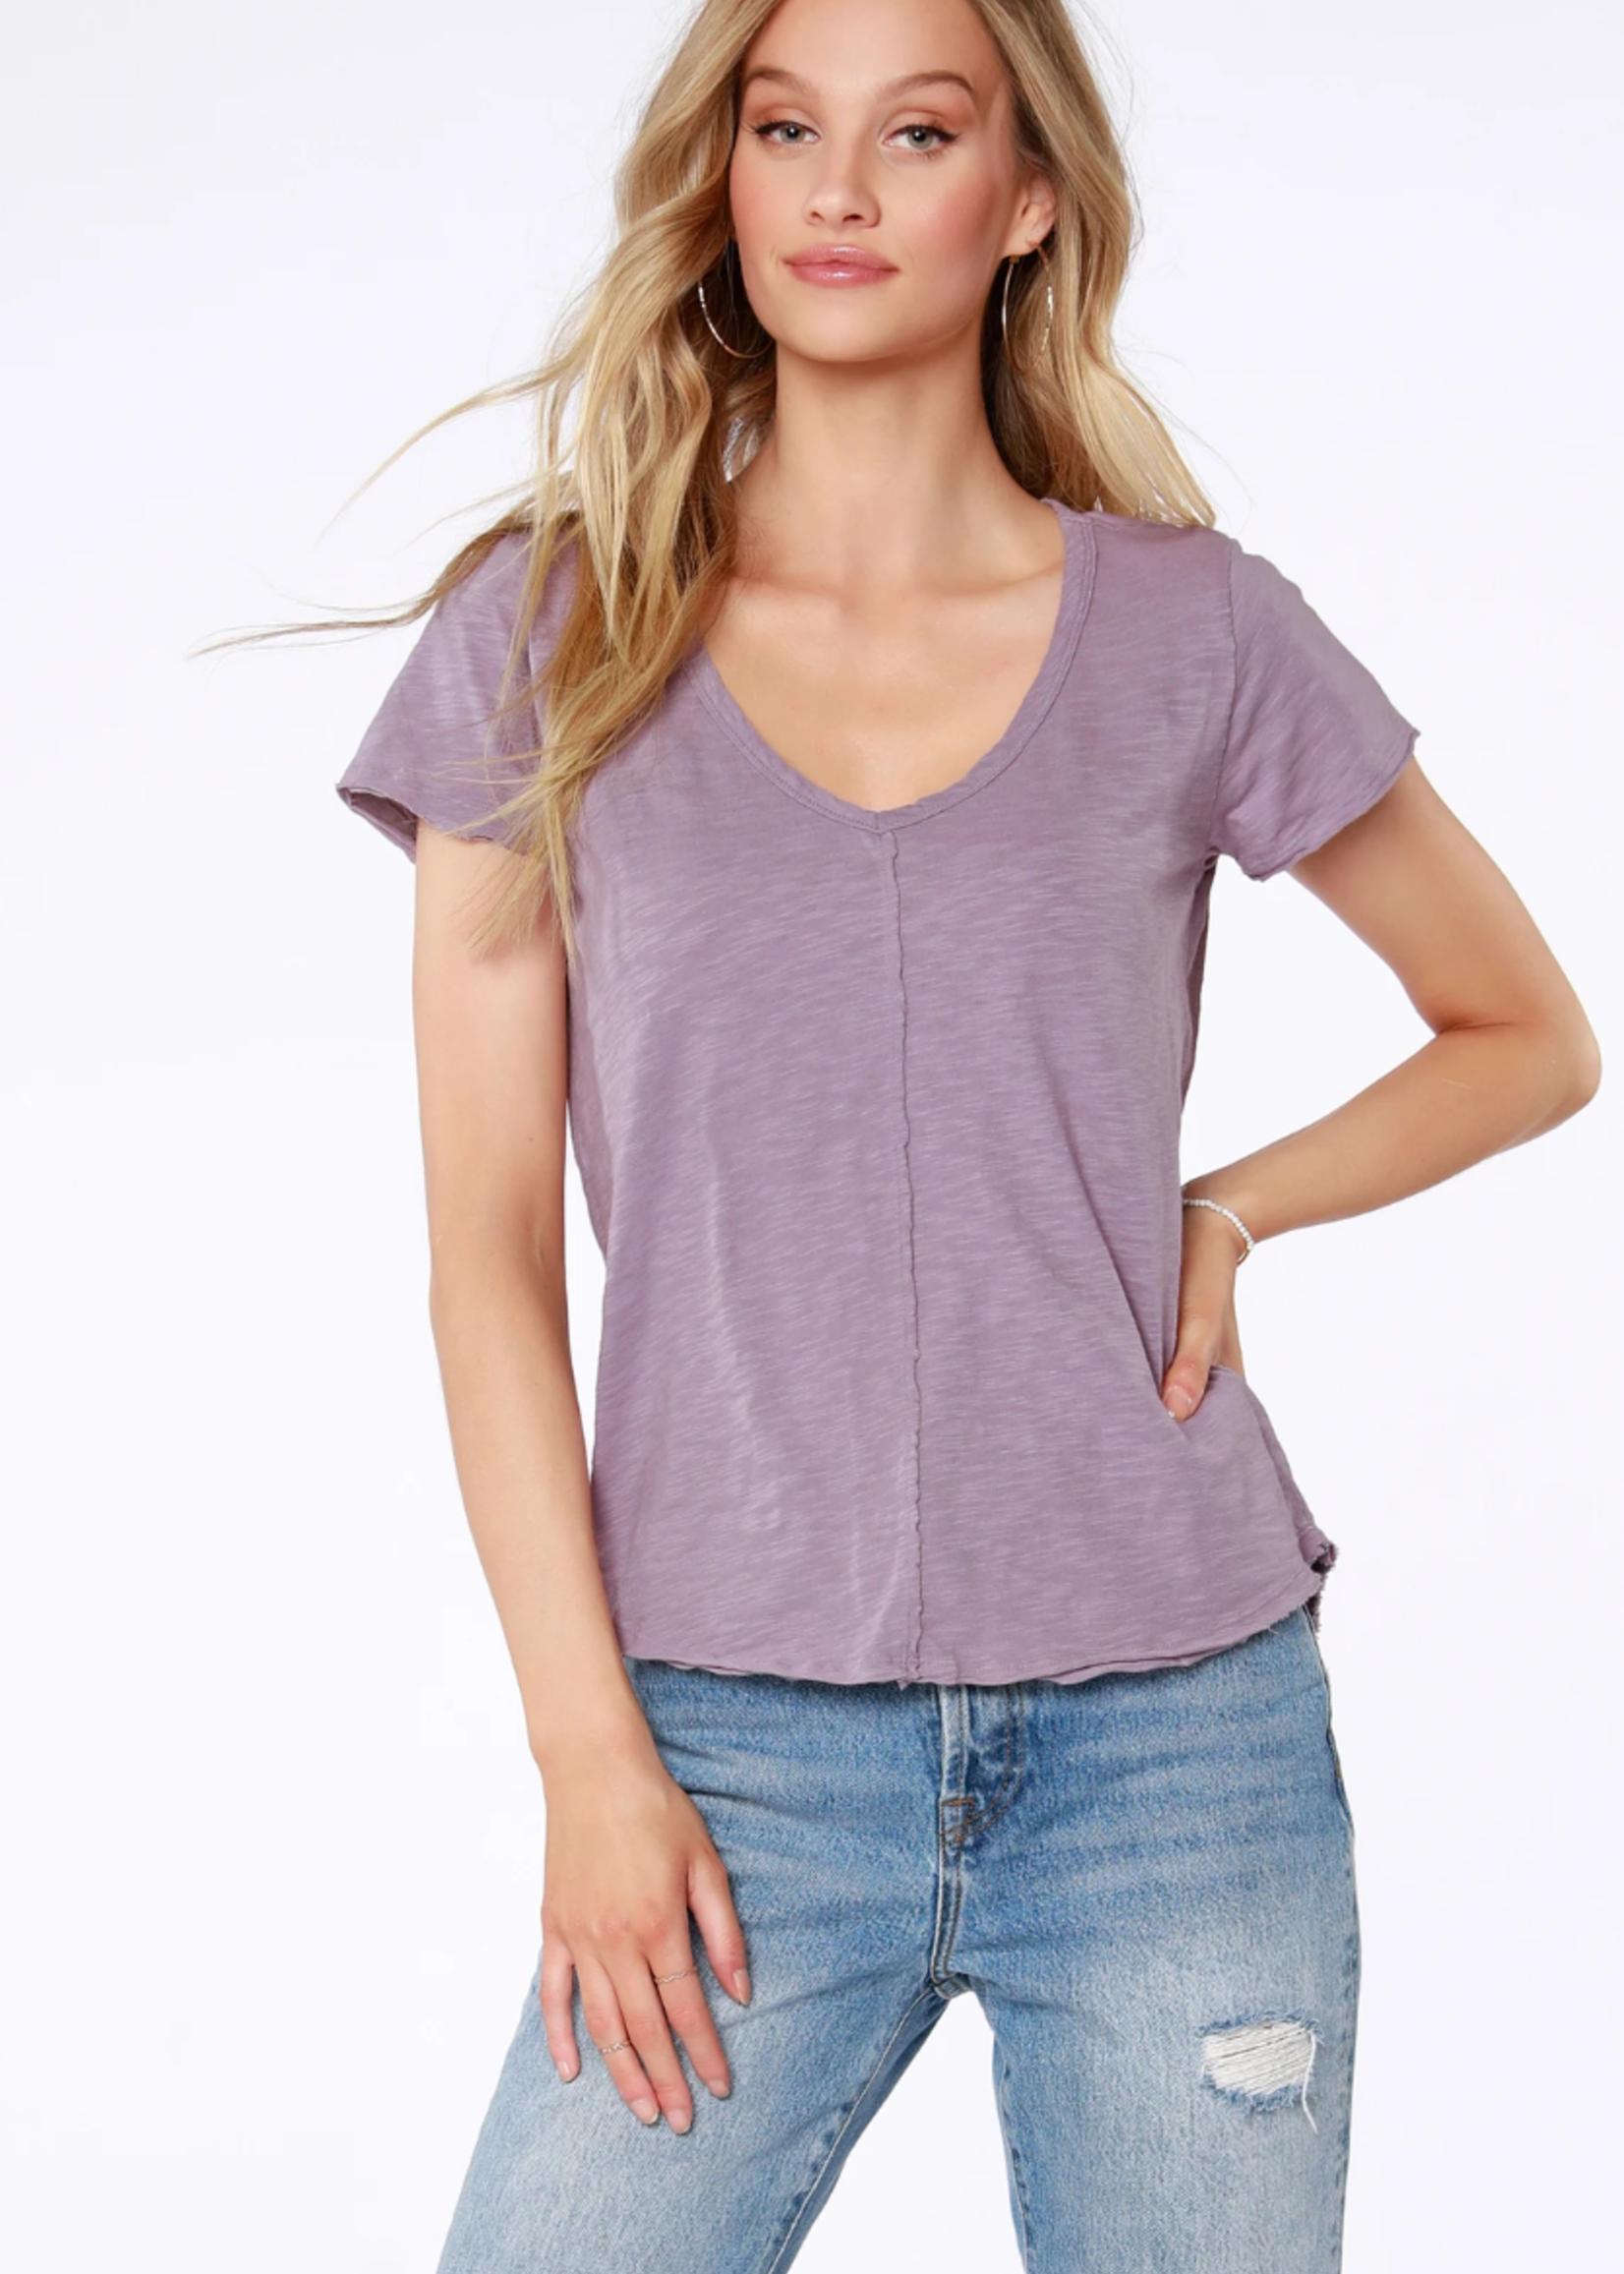 Bobi Short Sleeve Frayed Edge Tee - Lavender